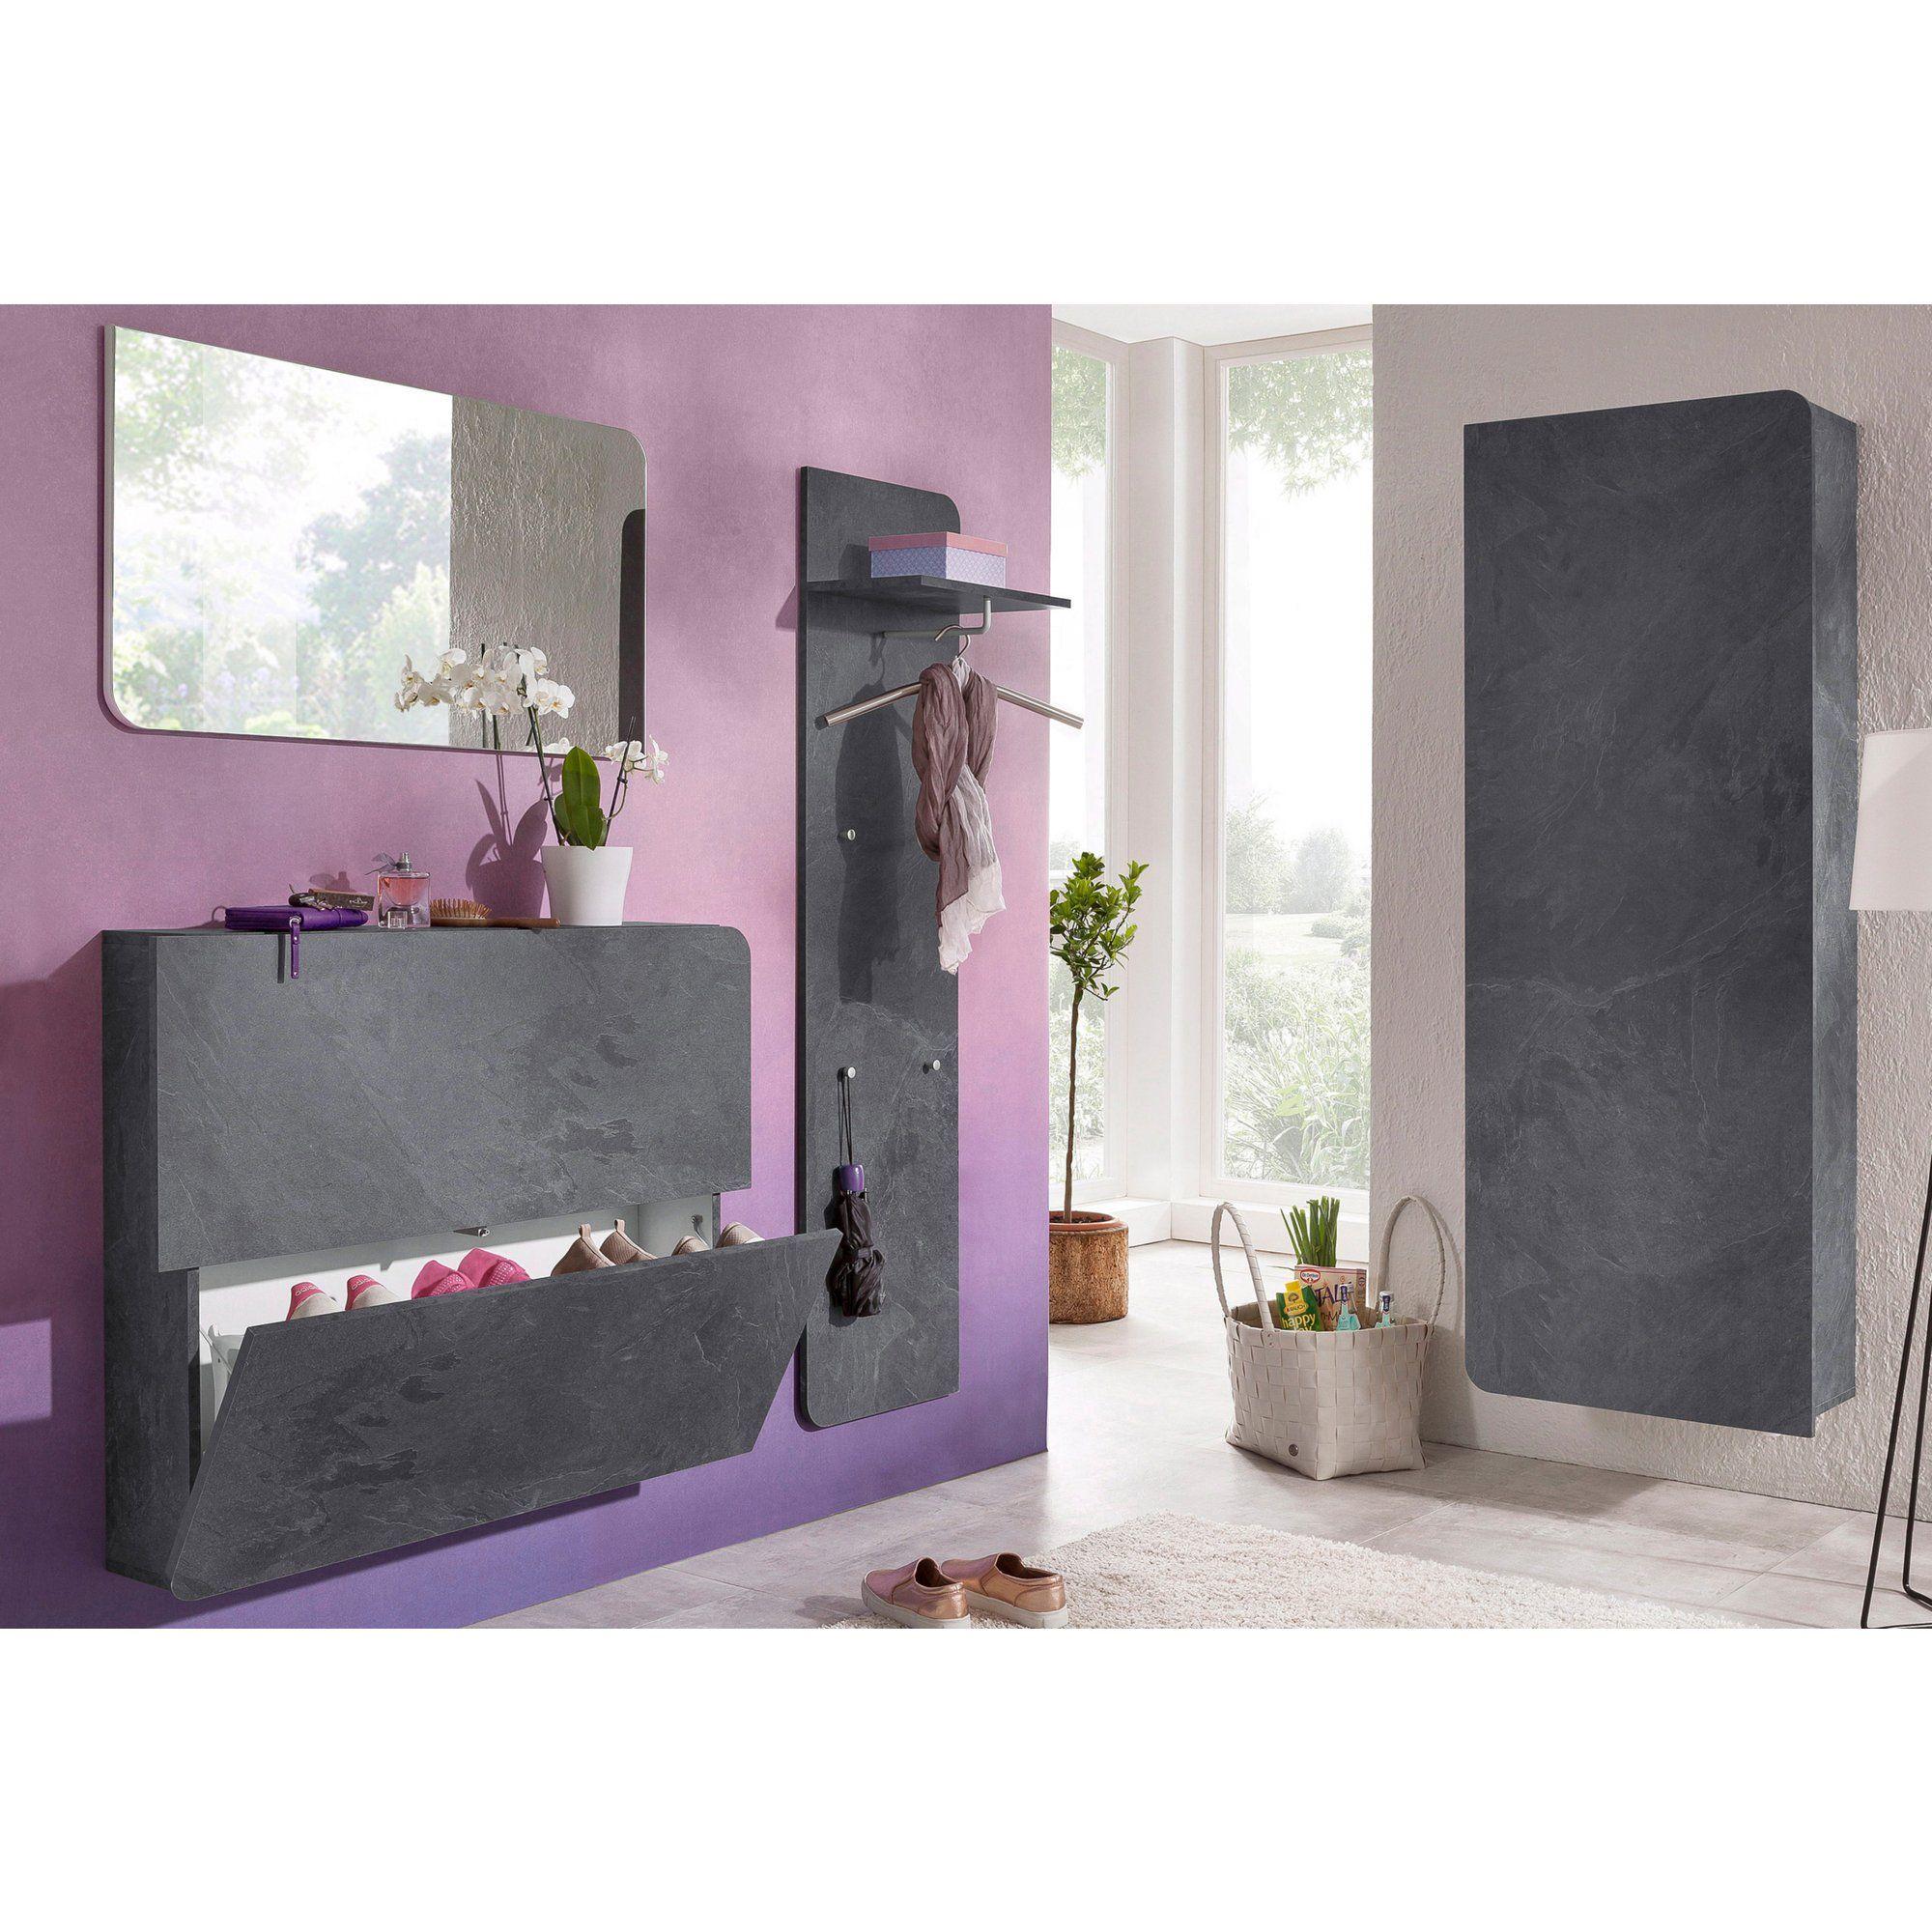 meuble chaussures mural ou poser 2 abattants distingu e murale et dressing. Black Bedroom Furniture Sets. Home Design Ideas